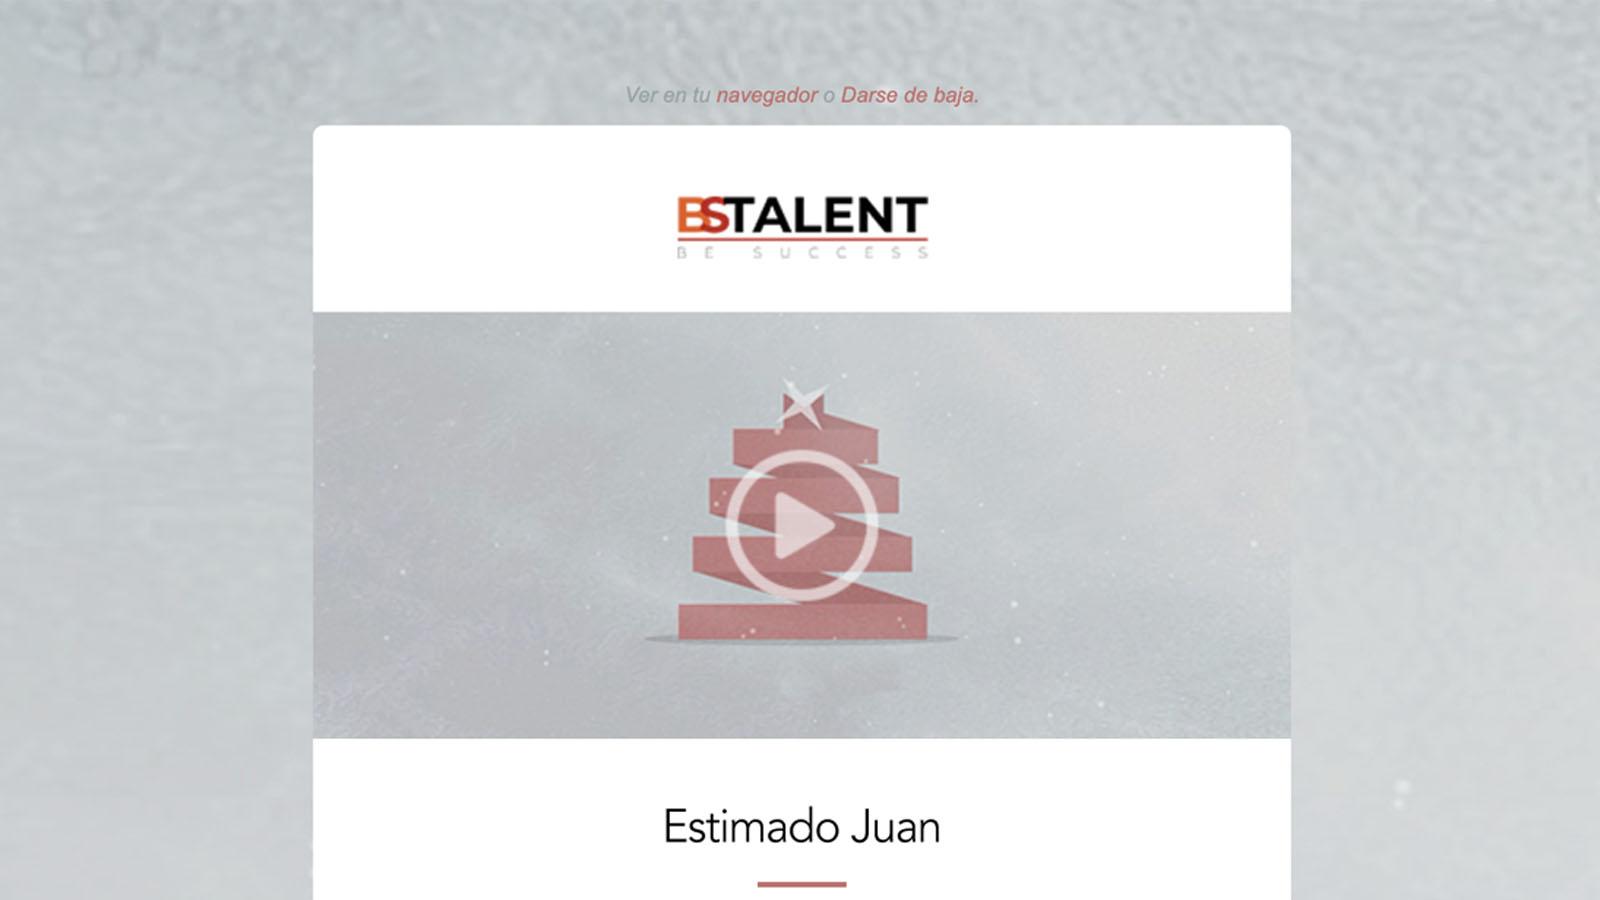 campaña emailing bs talent - víctor merino | vídeo marketing online